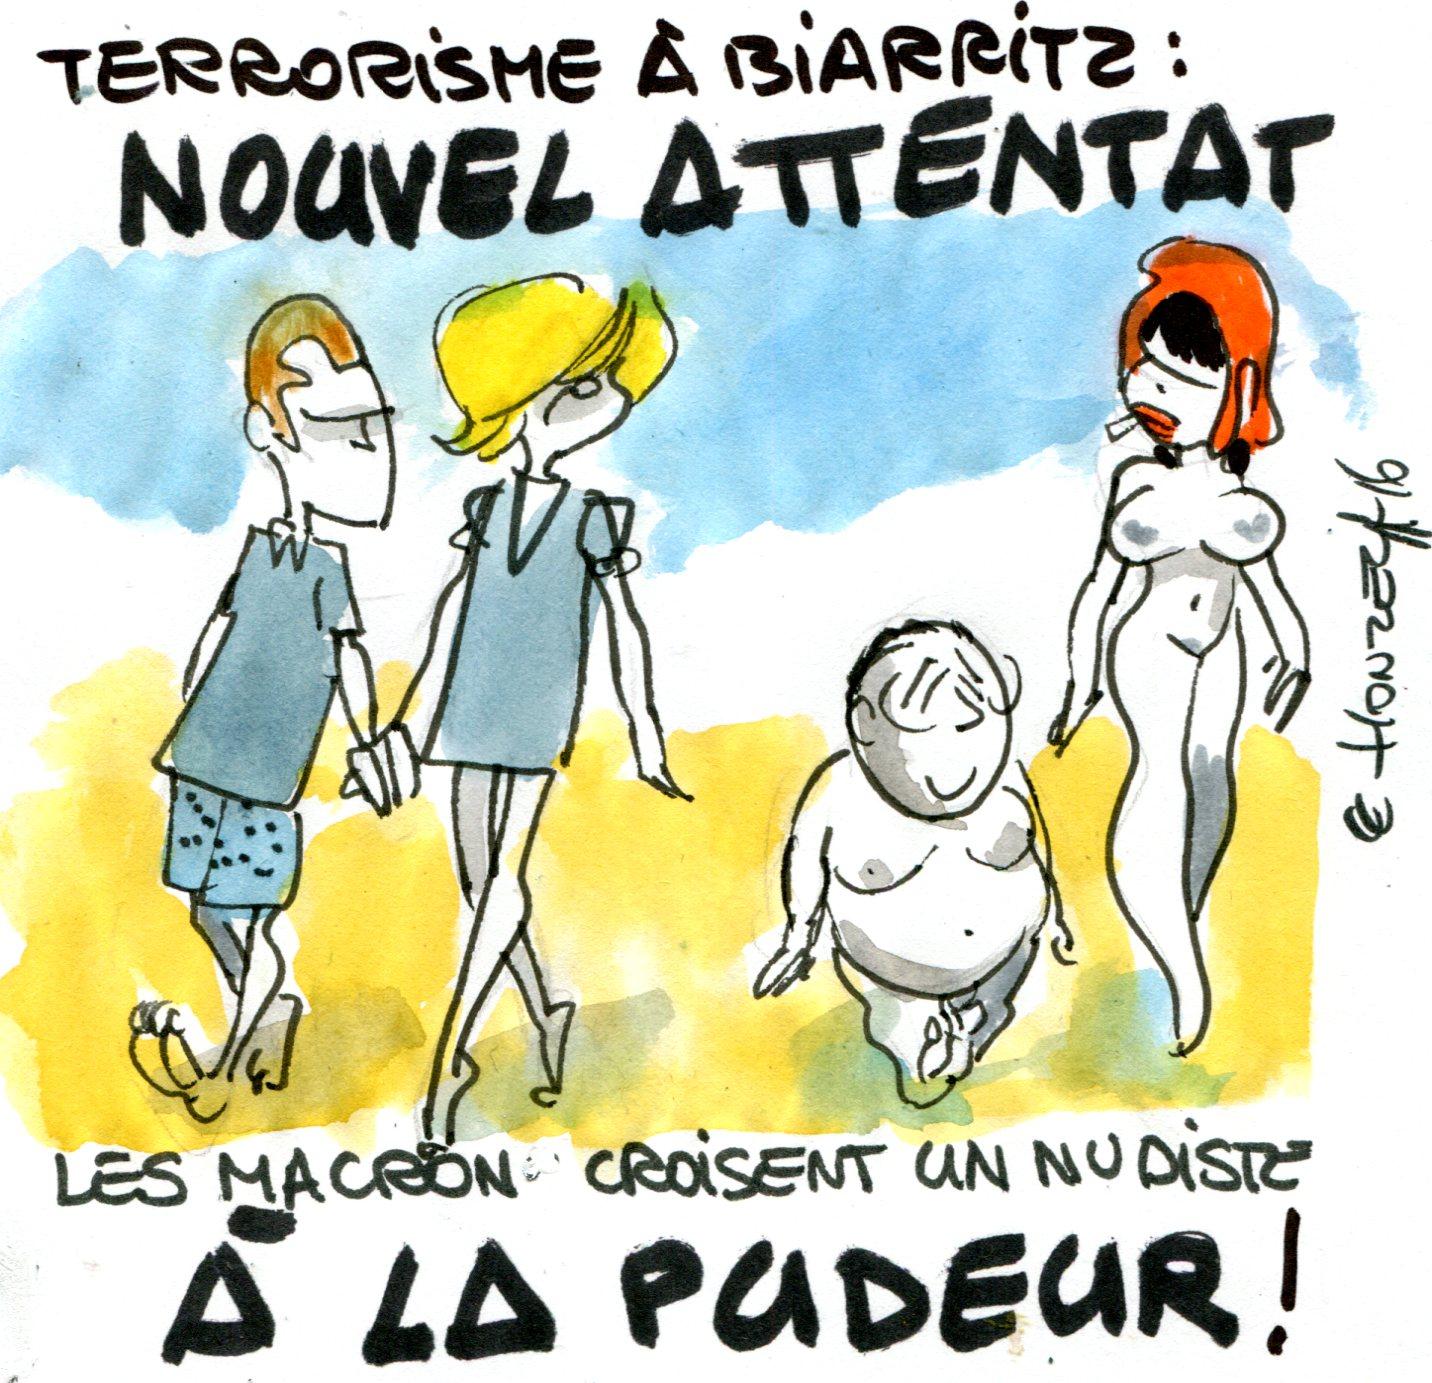 Emmanuel Macron croise un nudiste à Biarritz